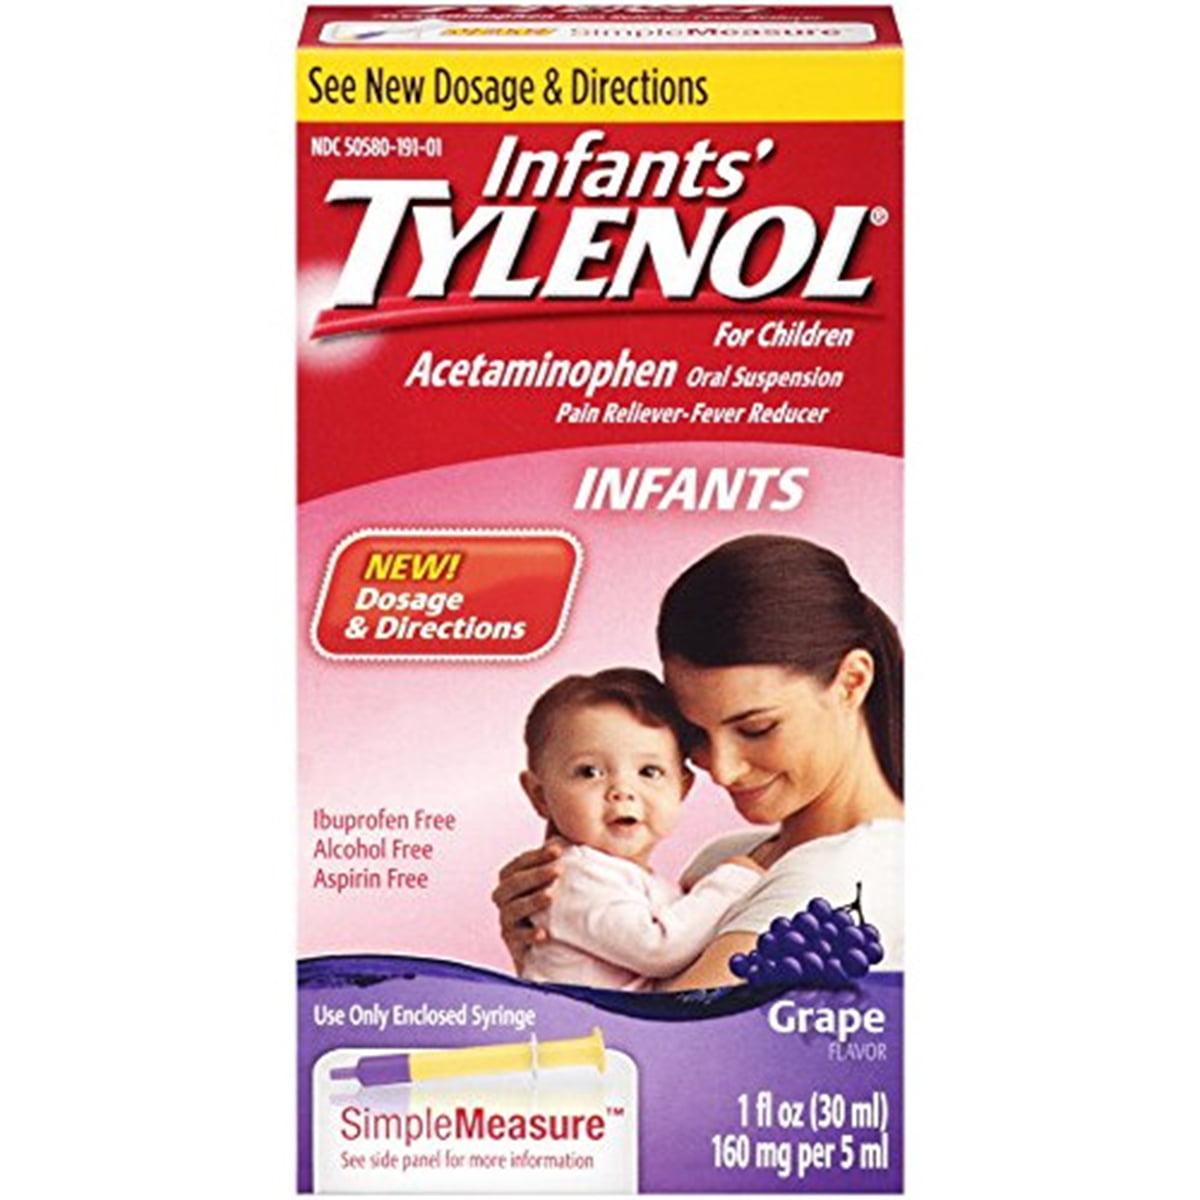 Infants' Tylenol Pain Reliever-Fever Reducer, Oral Suspension, Grape Flavor, 1 oz